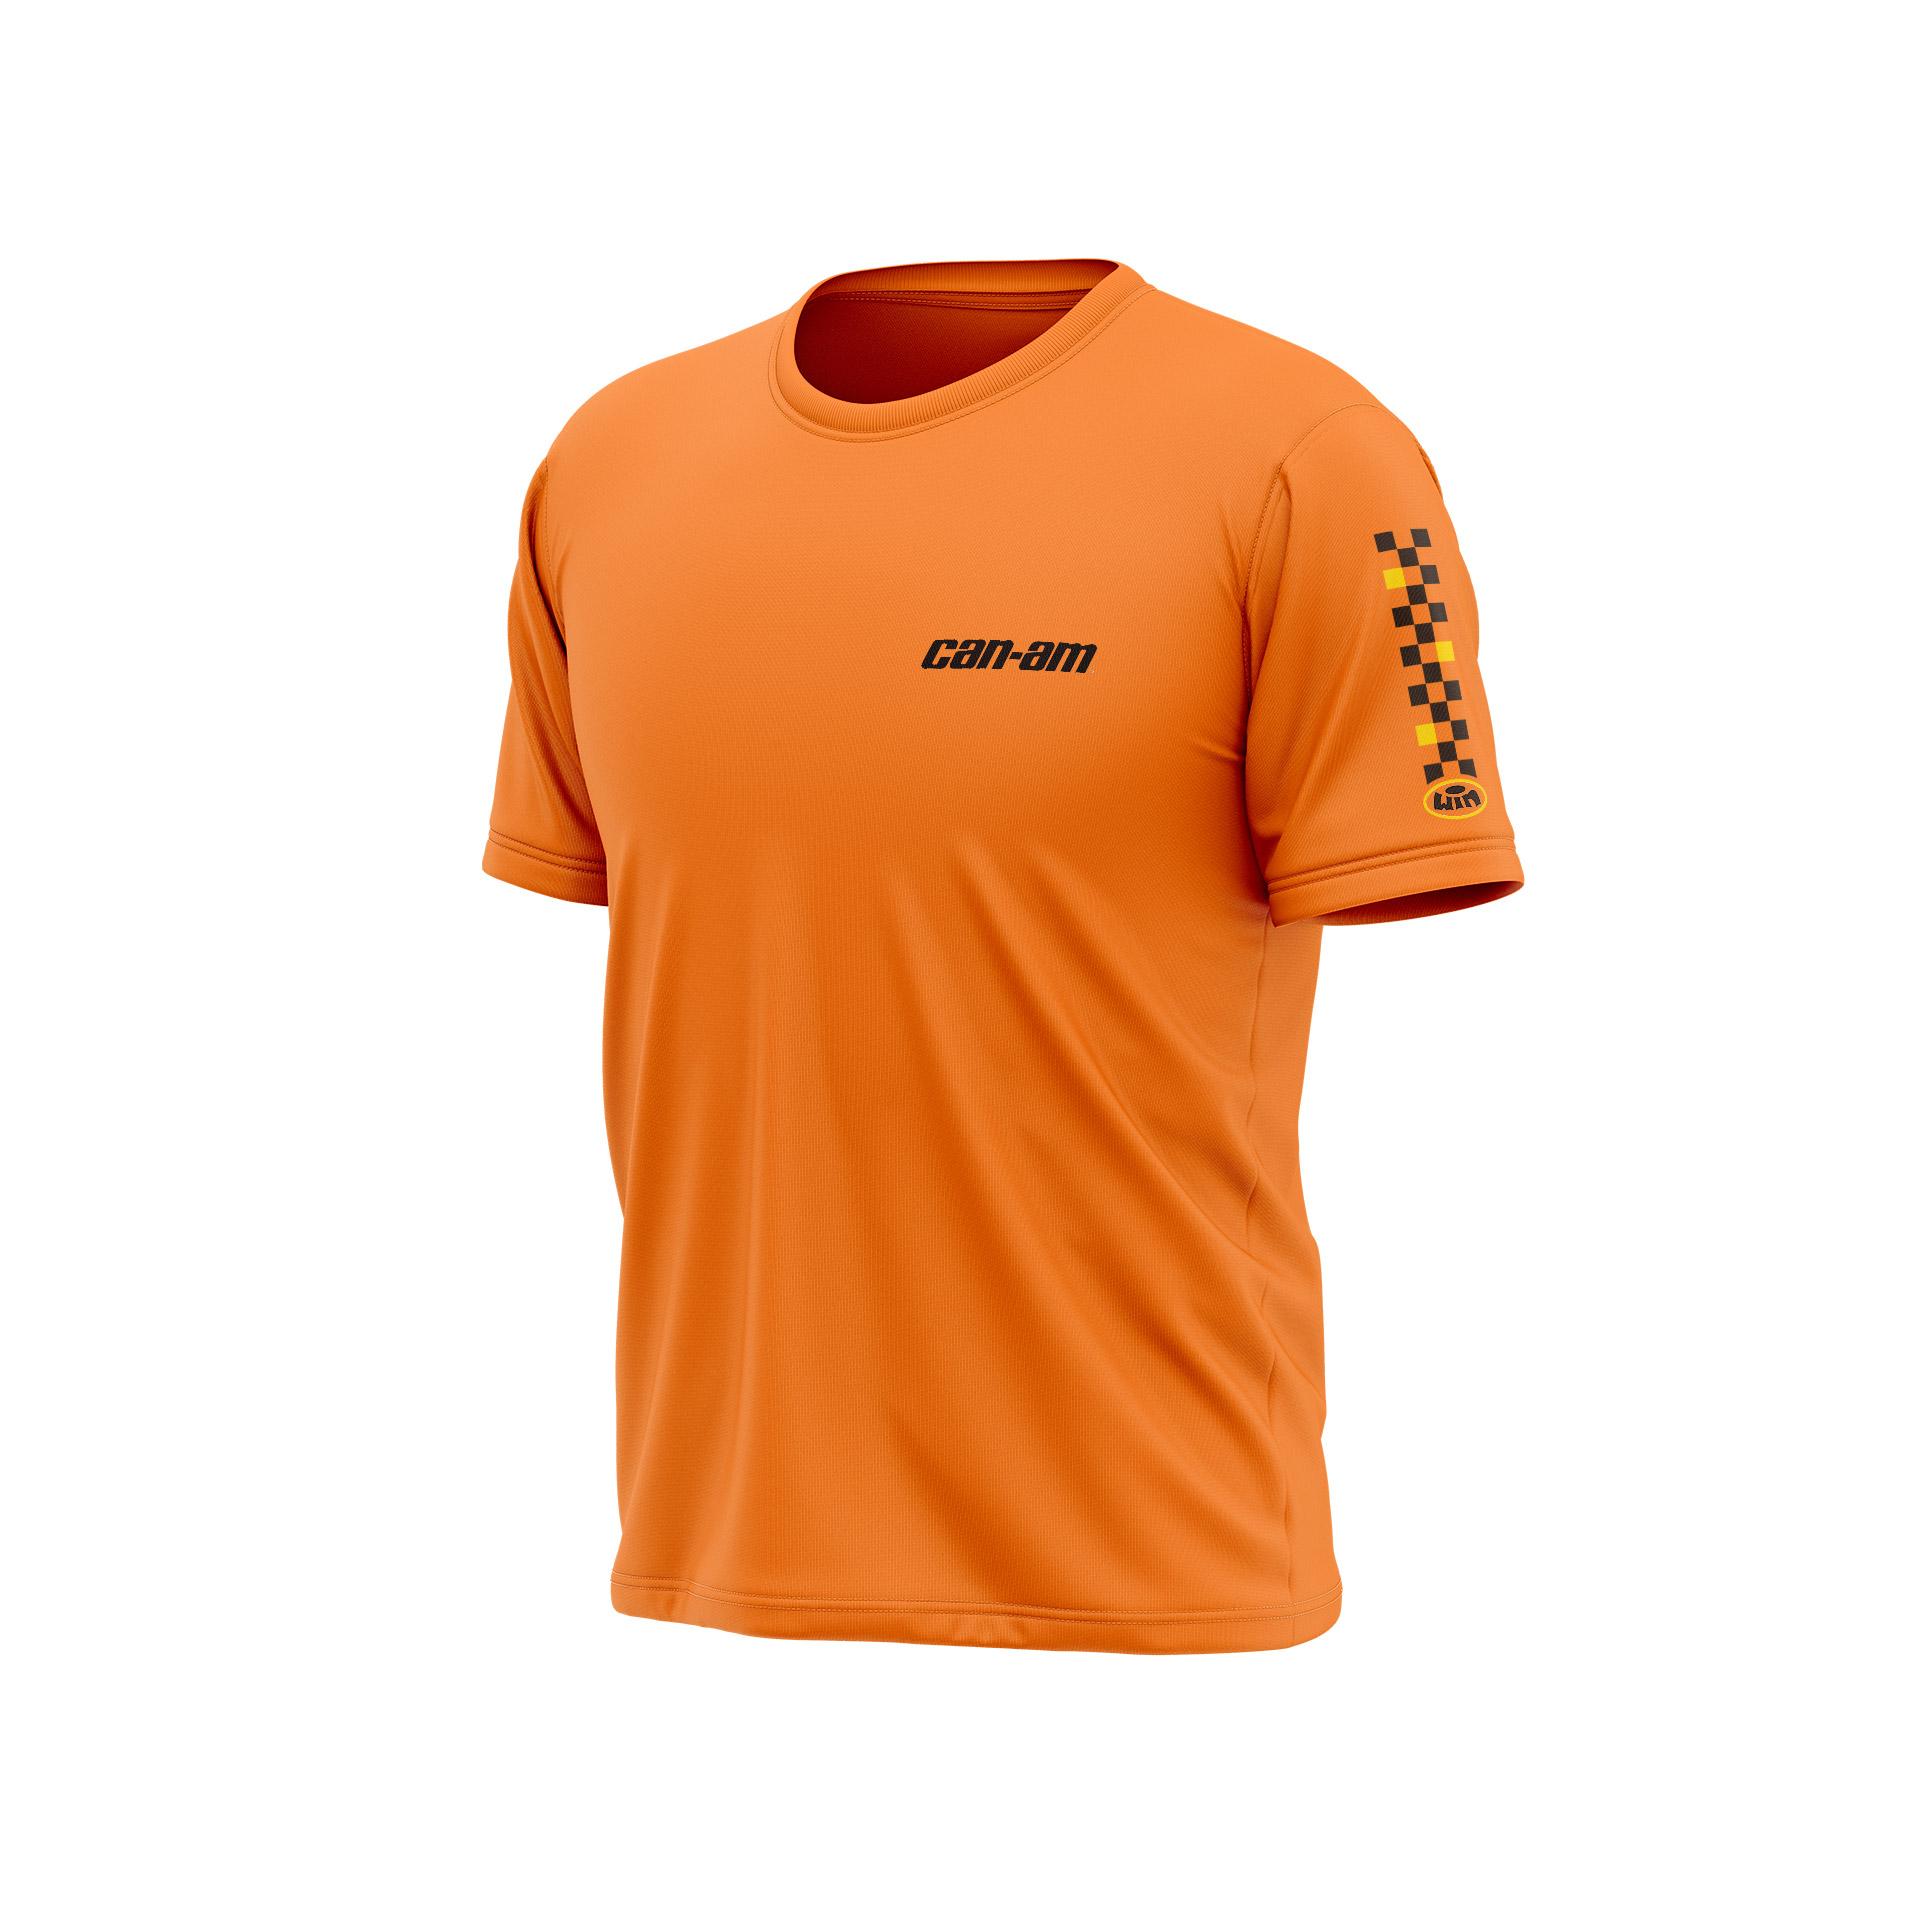 TSD CAN AM Heart Orange - Noir